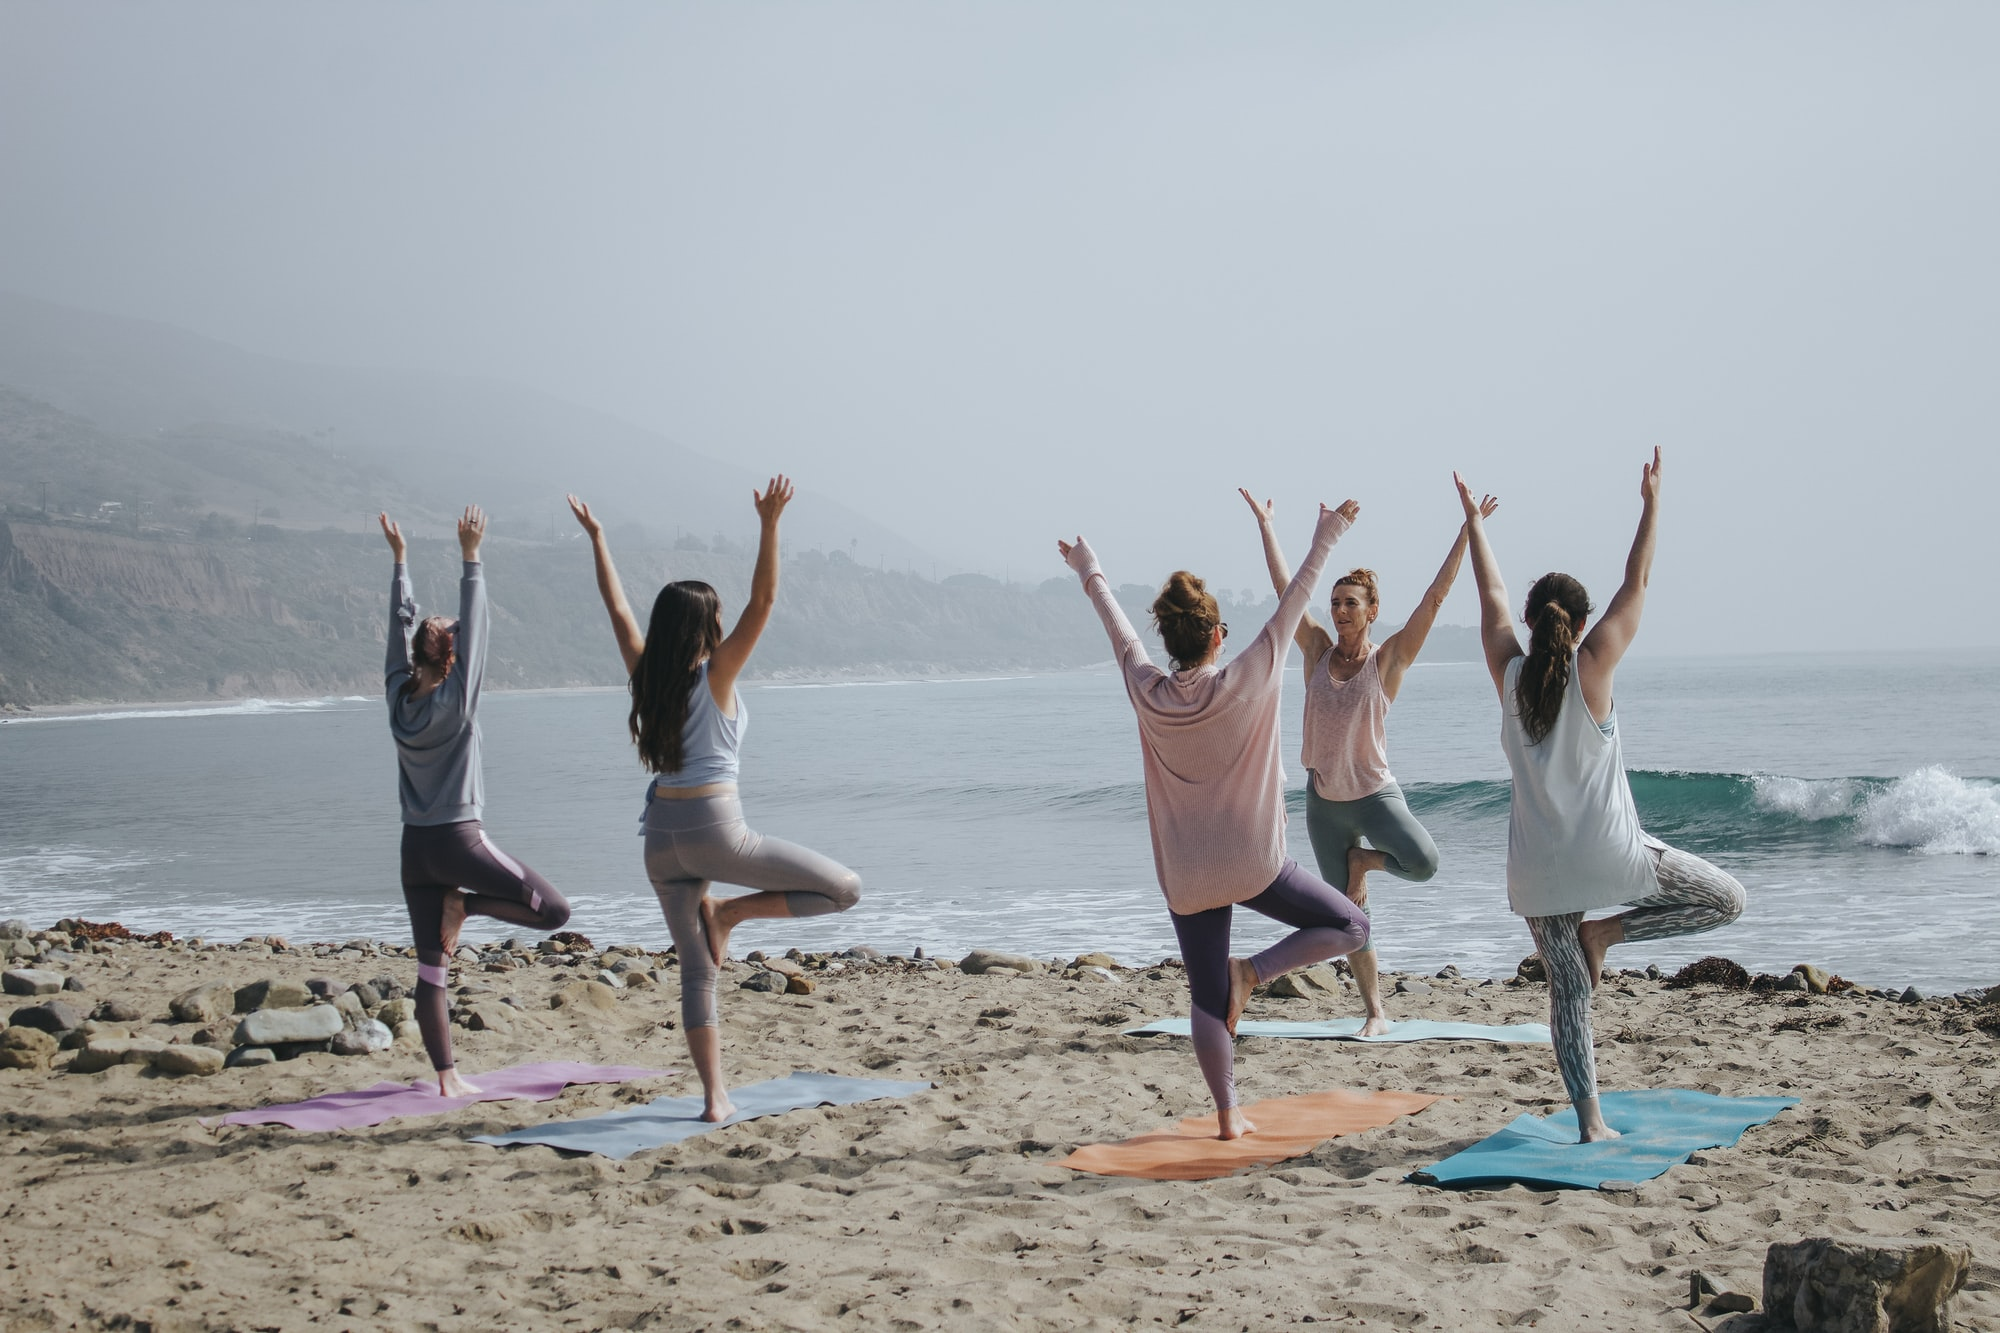 World flexes muscles on International Yoga Day